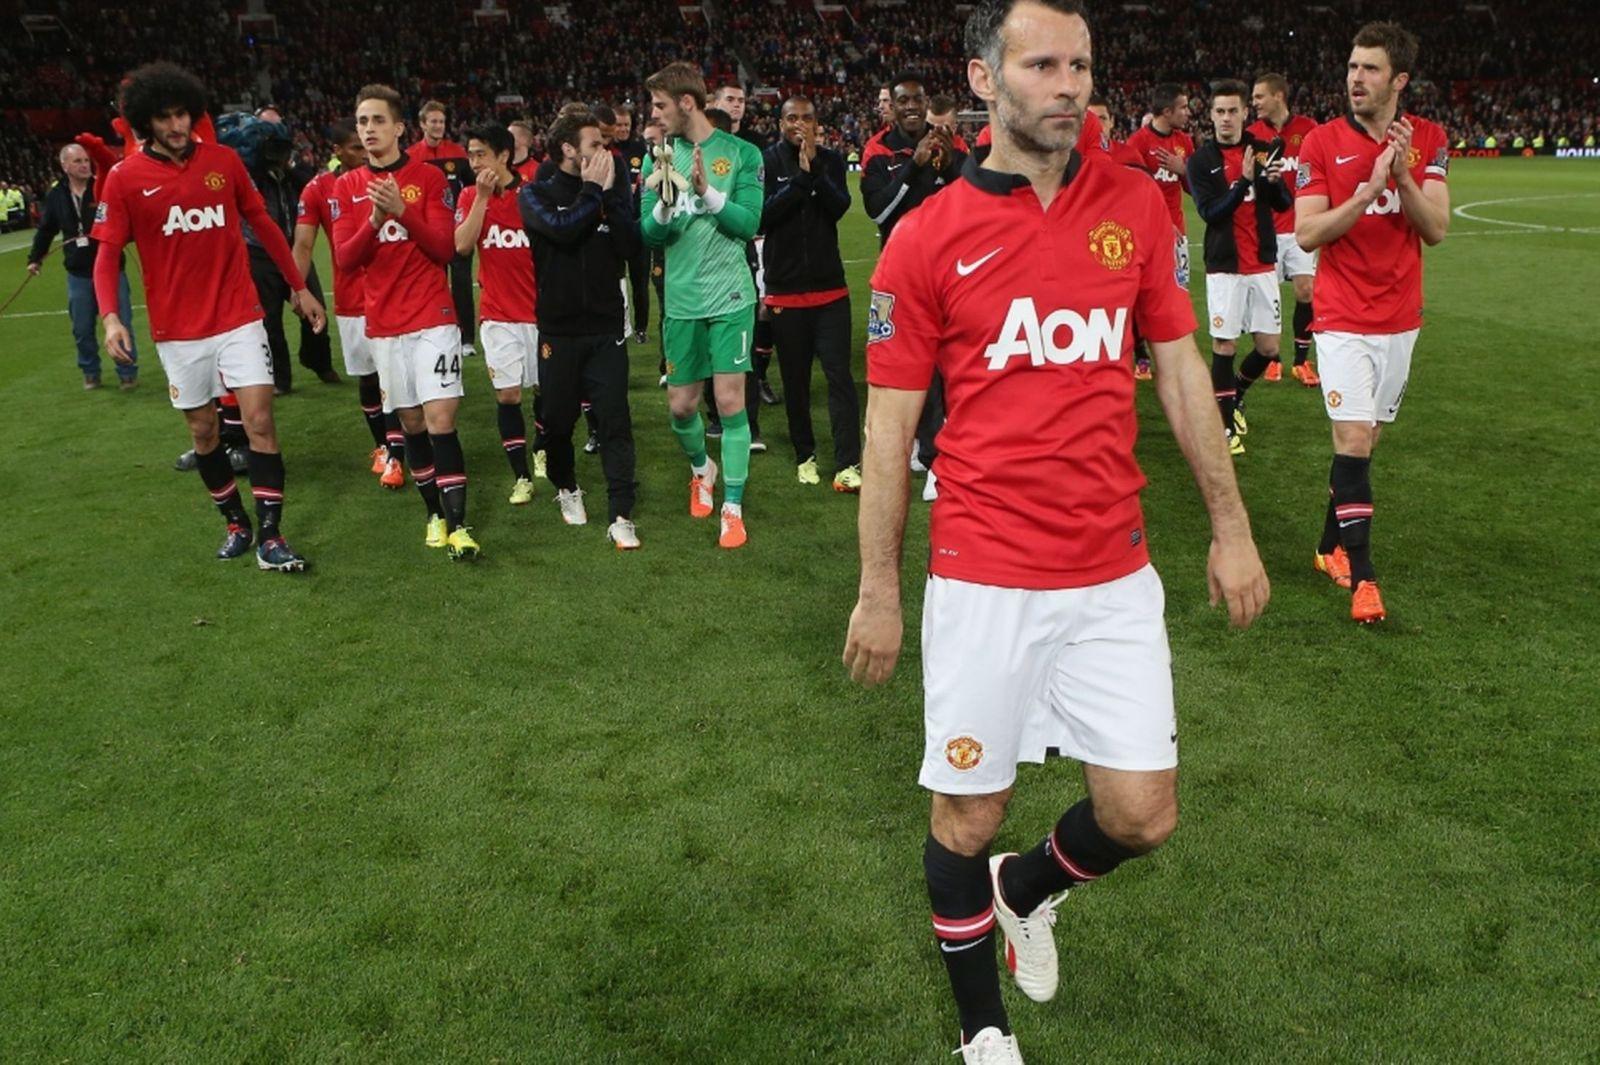 [Изображение: Manchester-United-v-Hull-City-Premier-League%20(3).jpg]